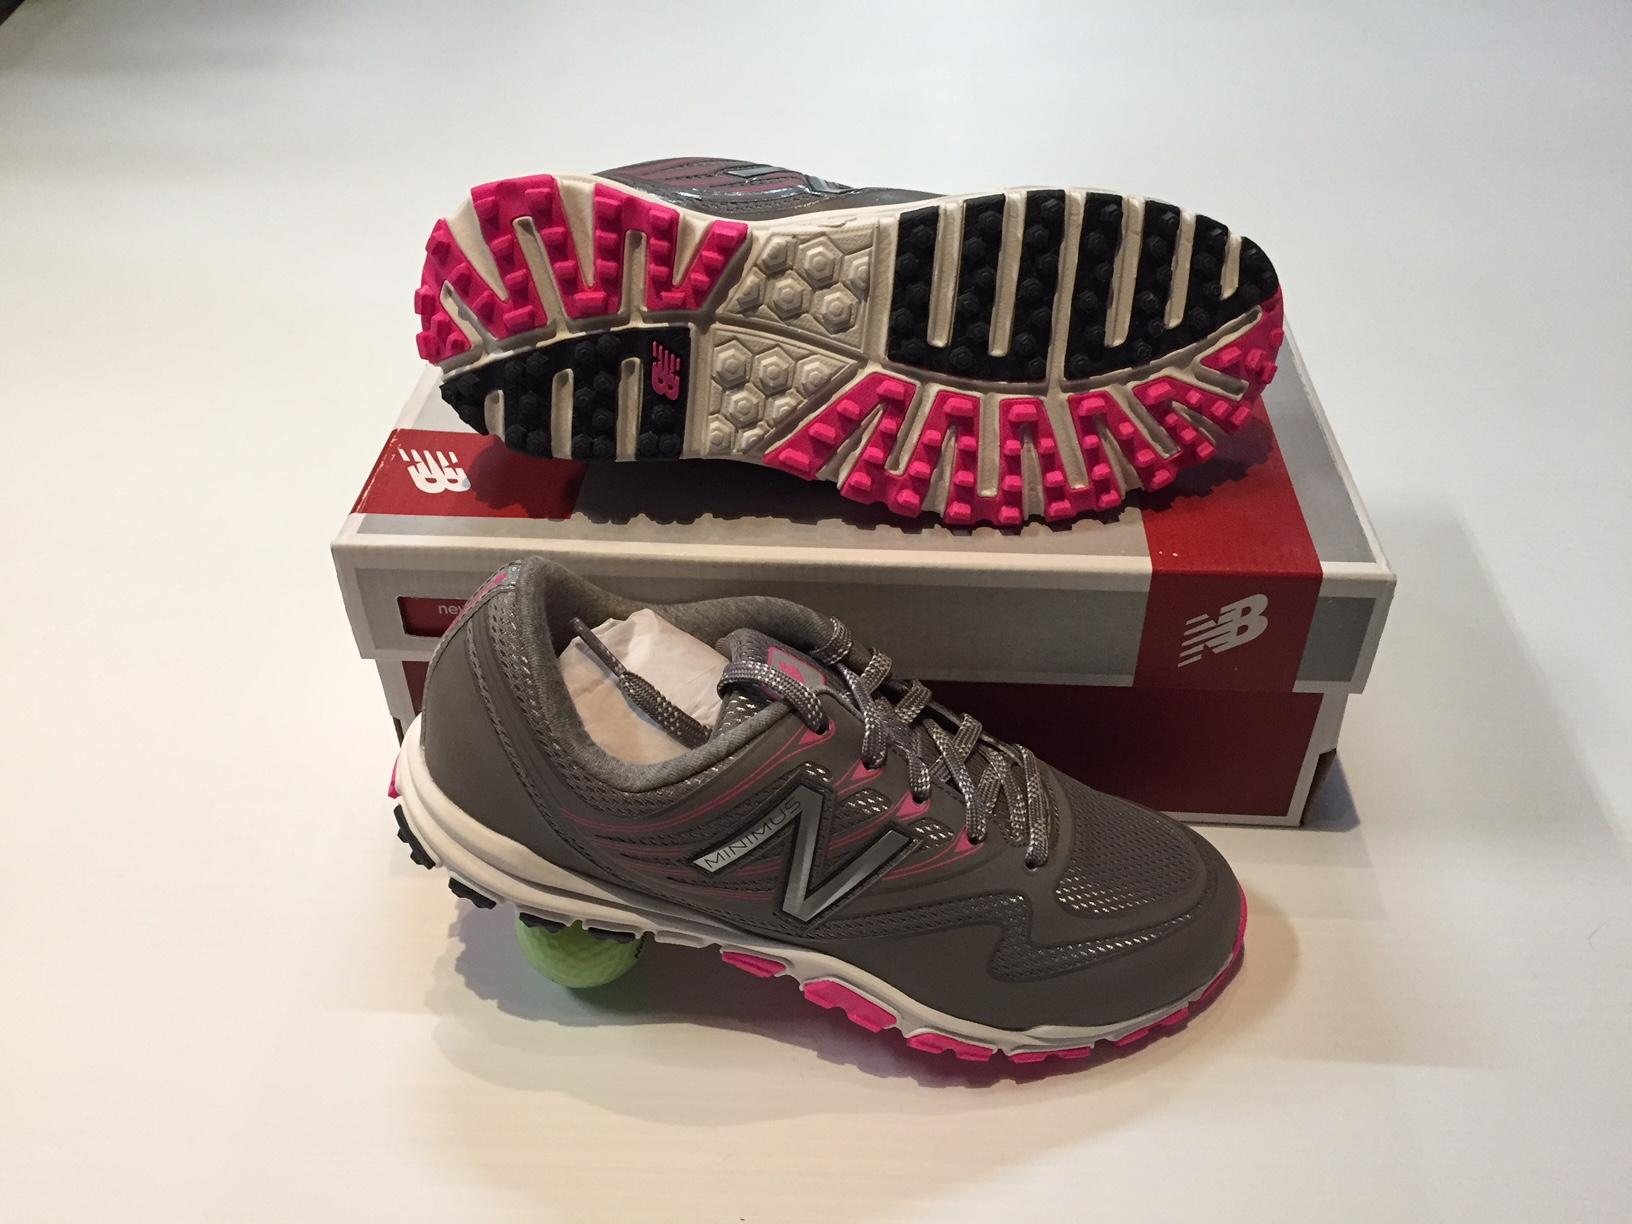 a7f571342c40 New Balance Women's Minimus Sport Pink/Grey Golf Shoes - Riverside ...